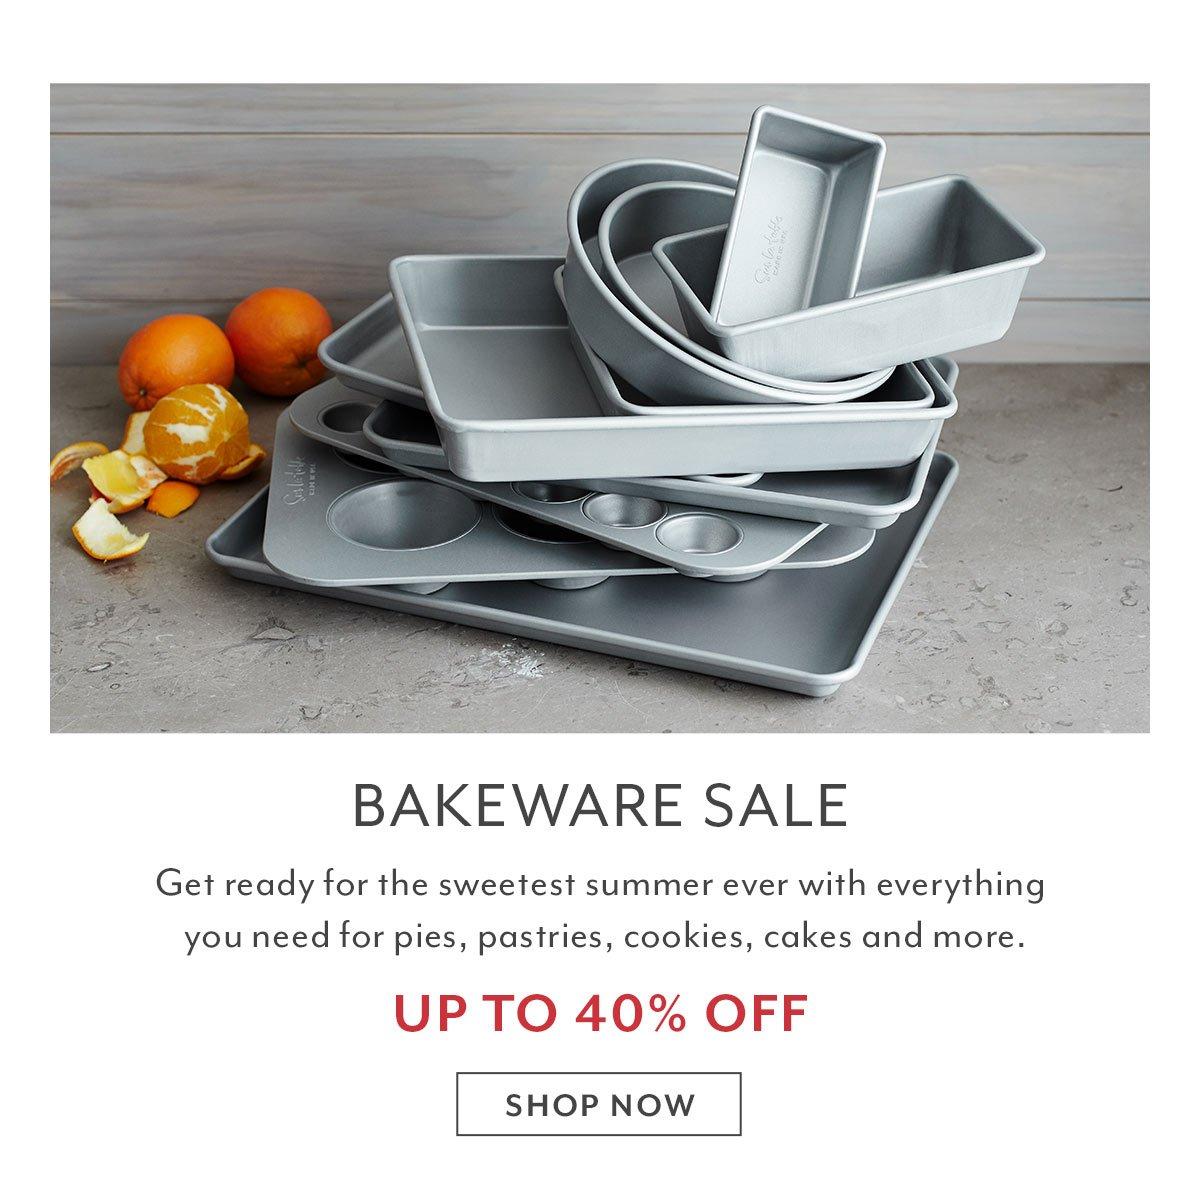 Bakeware Sale